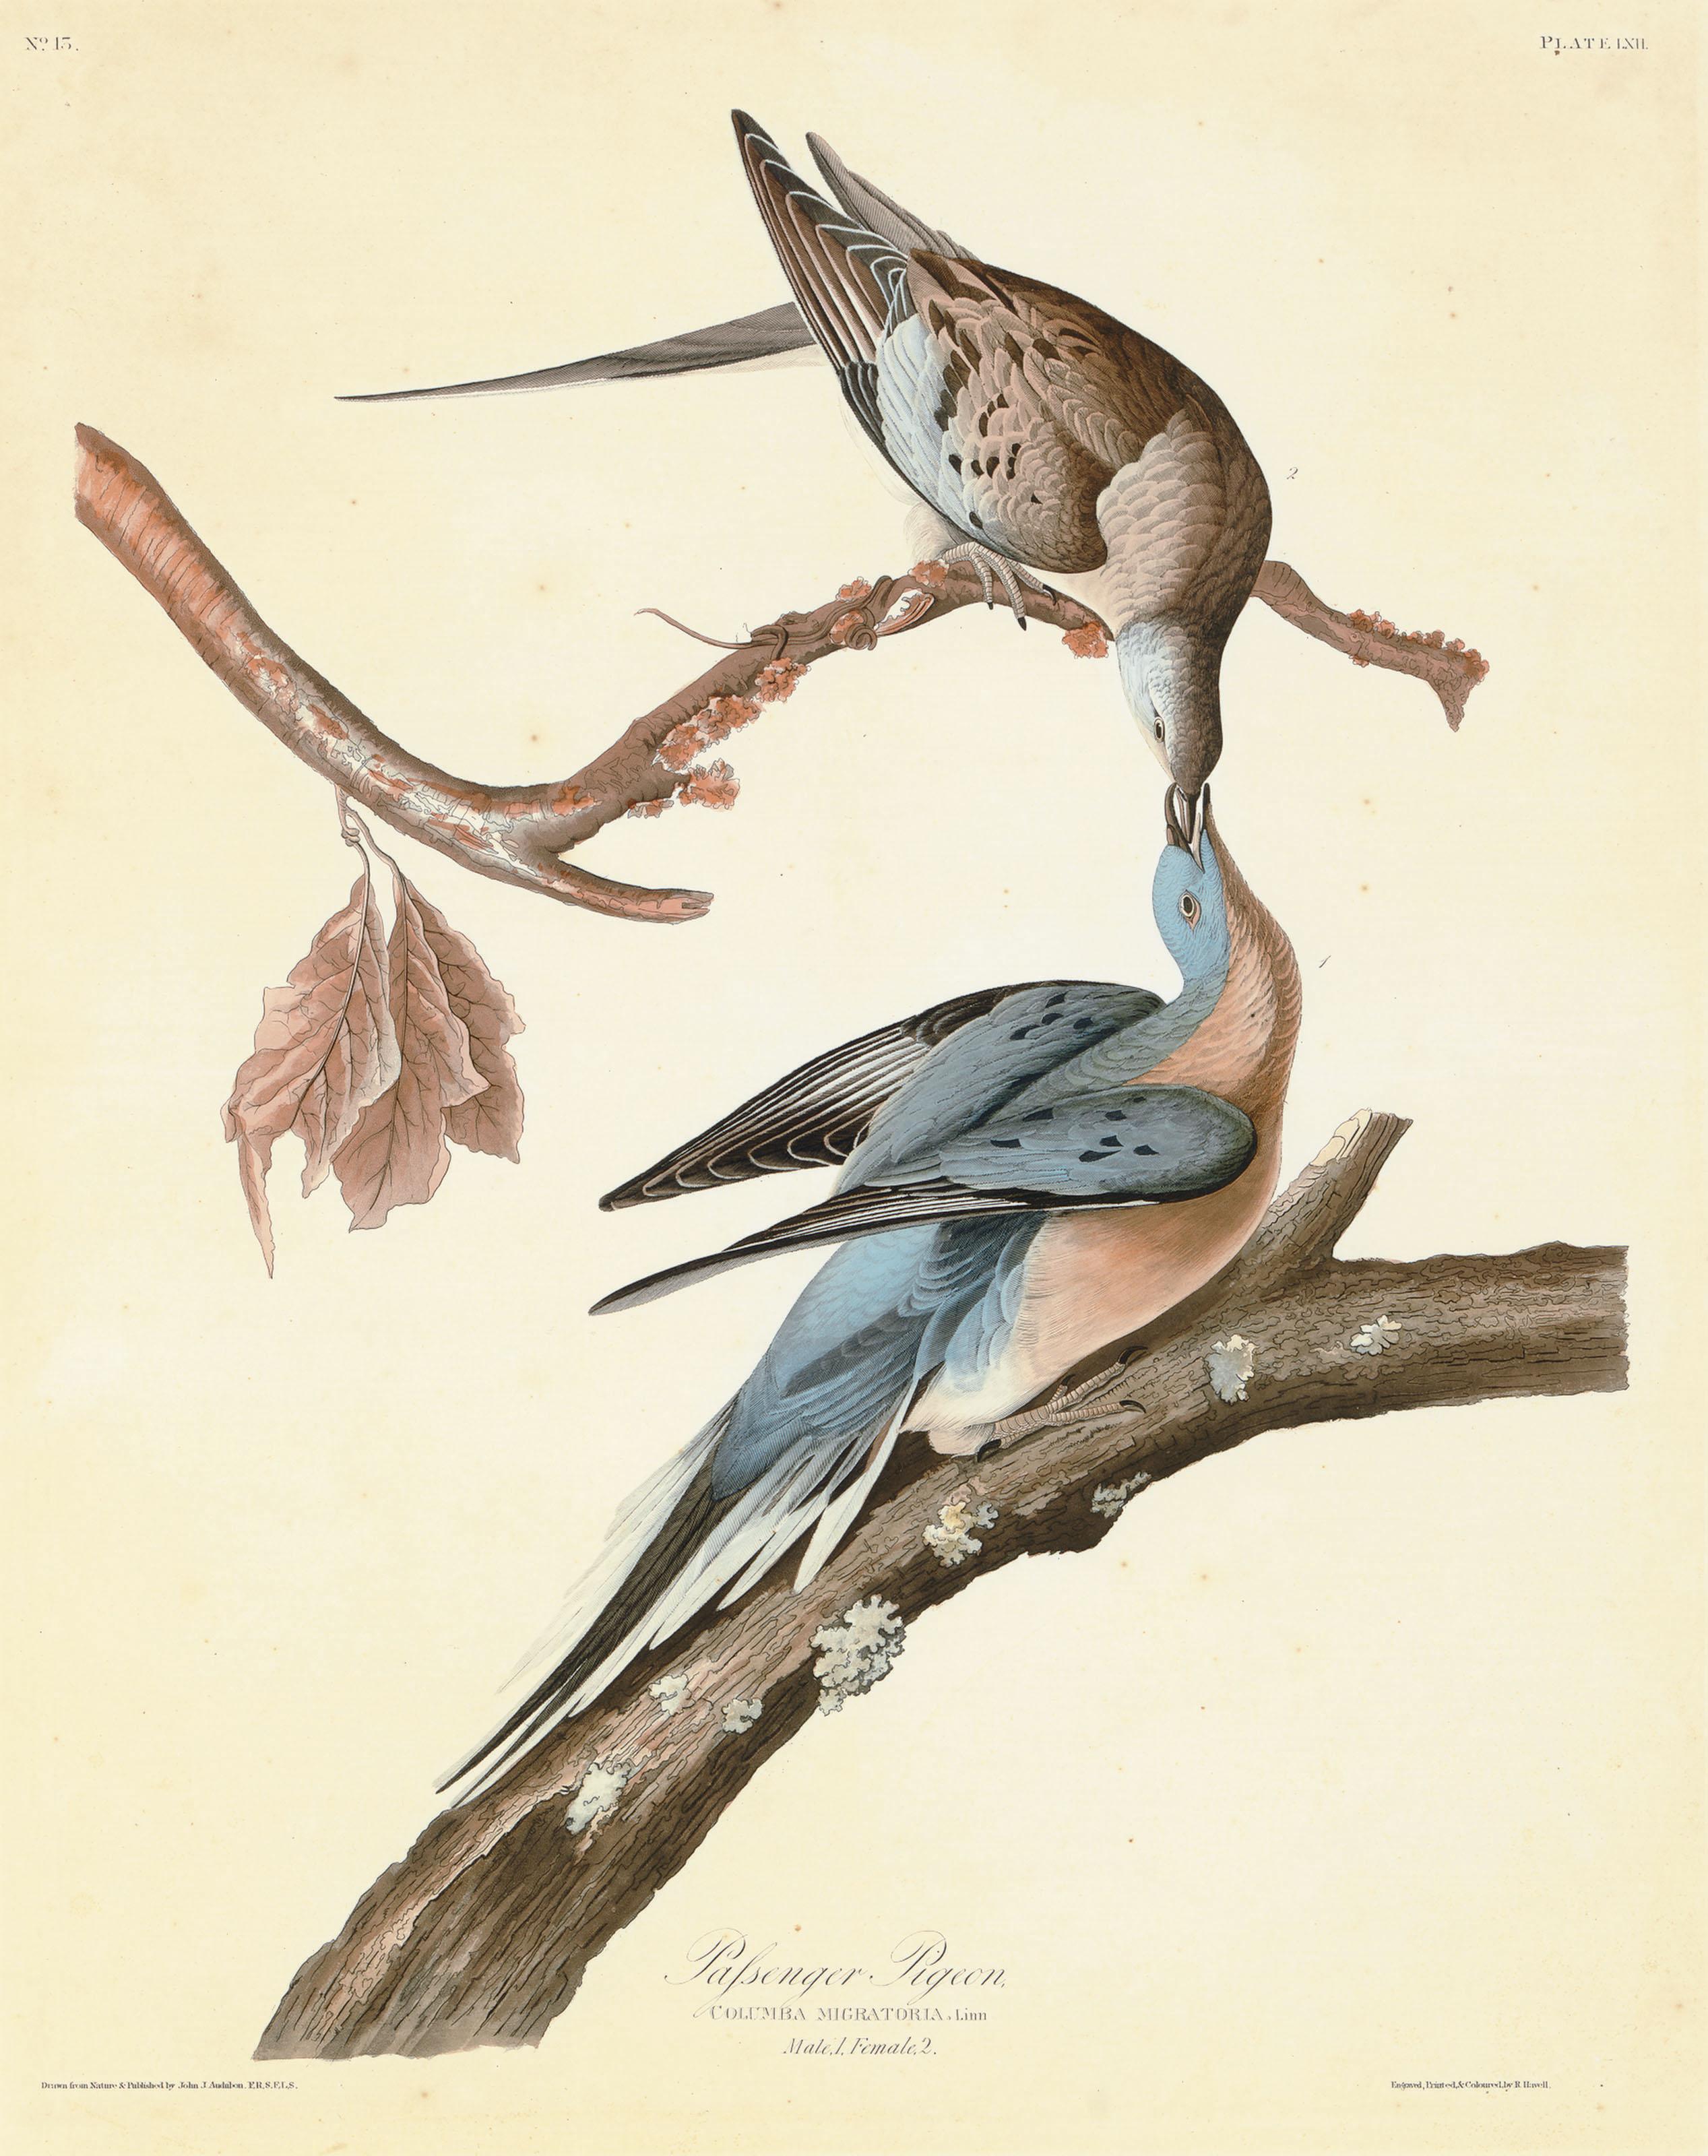 Passenger Pigeon (Plate LXII)  Columba migratoria  Variant 2